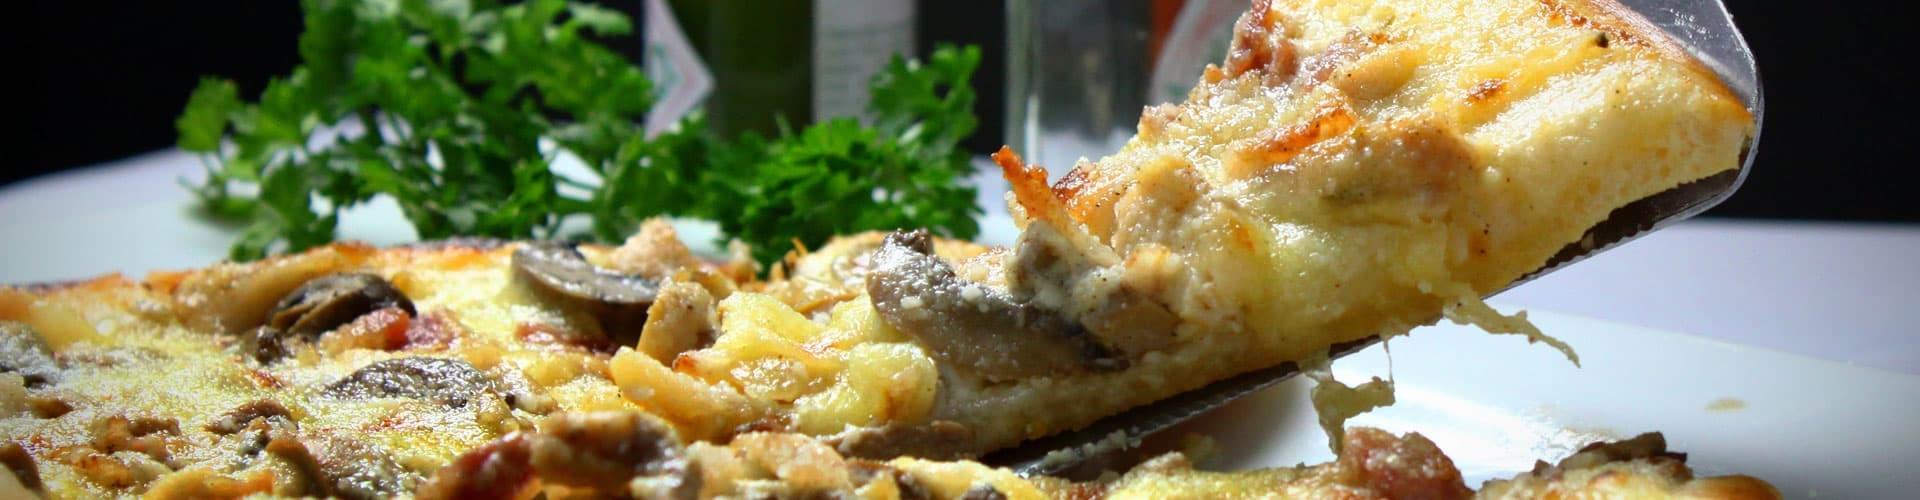 Regional foods - Campania